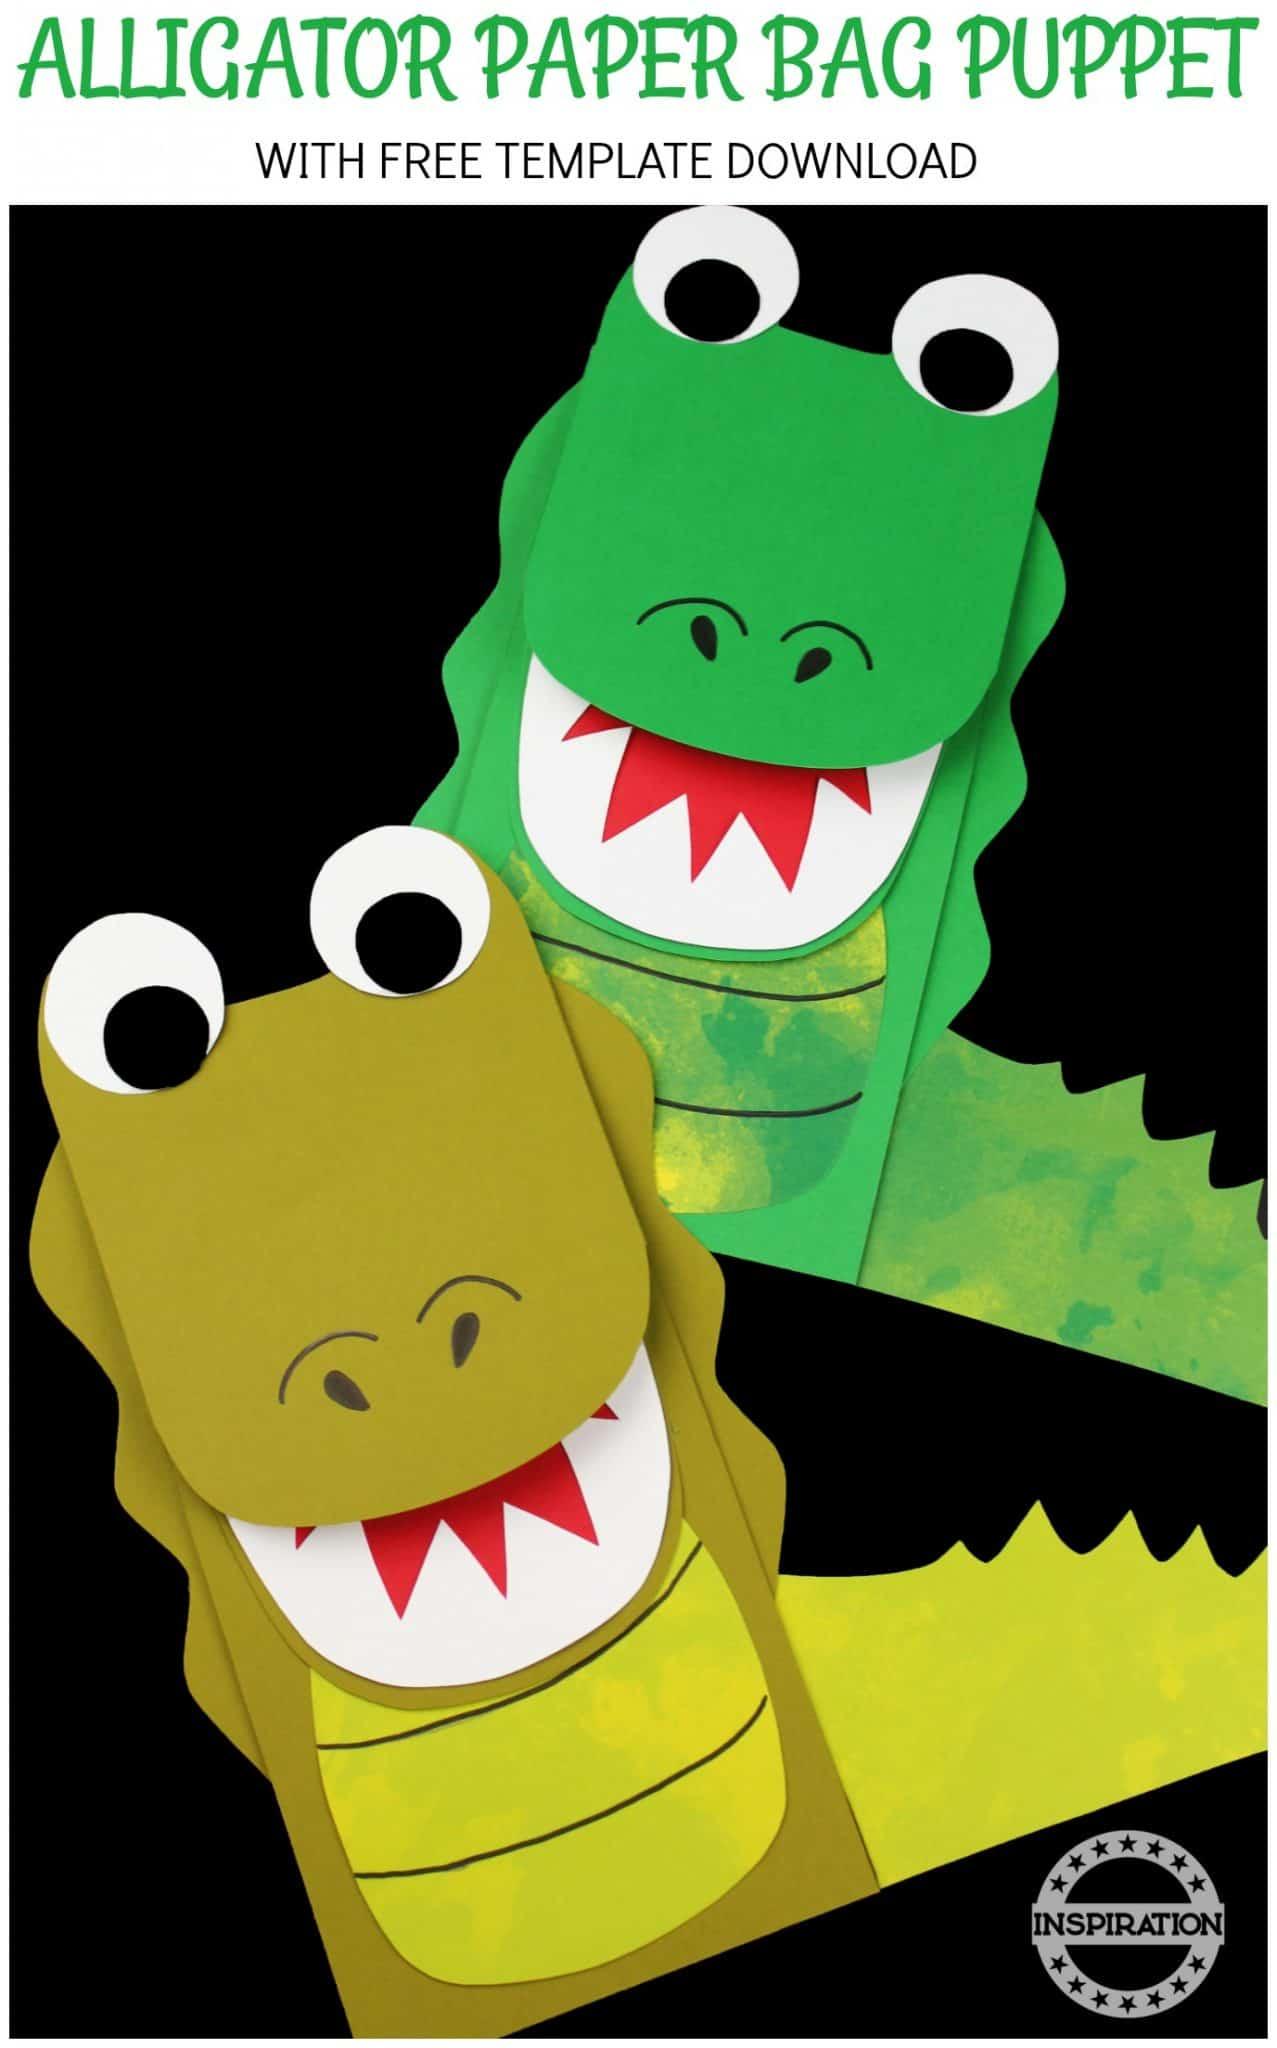 Alligator Craft And Paper Bag Puppet For Preschoolers